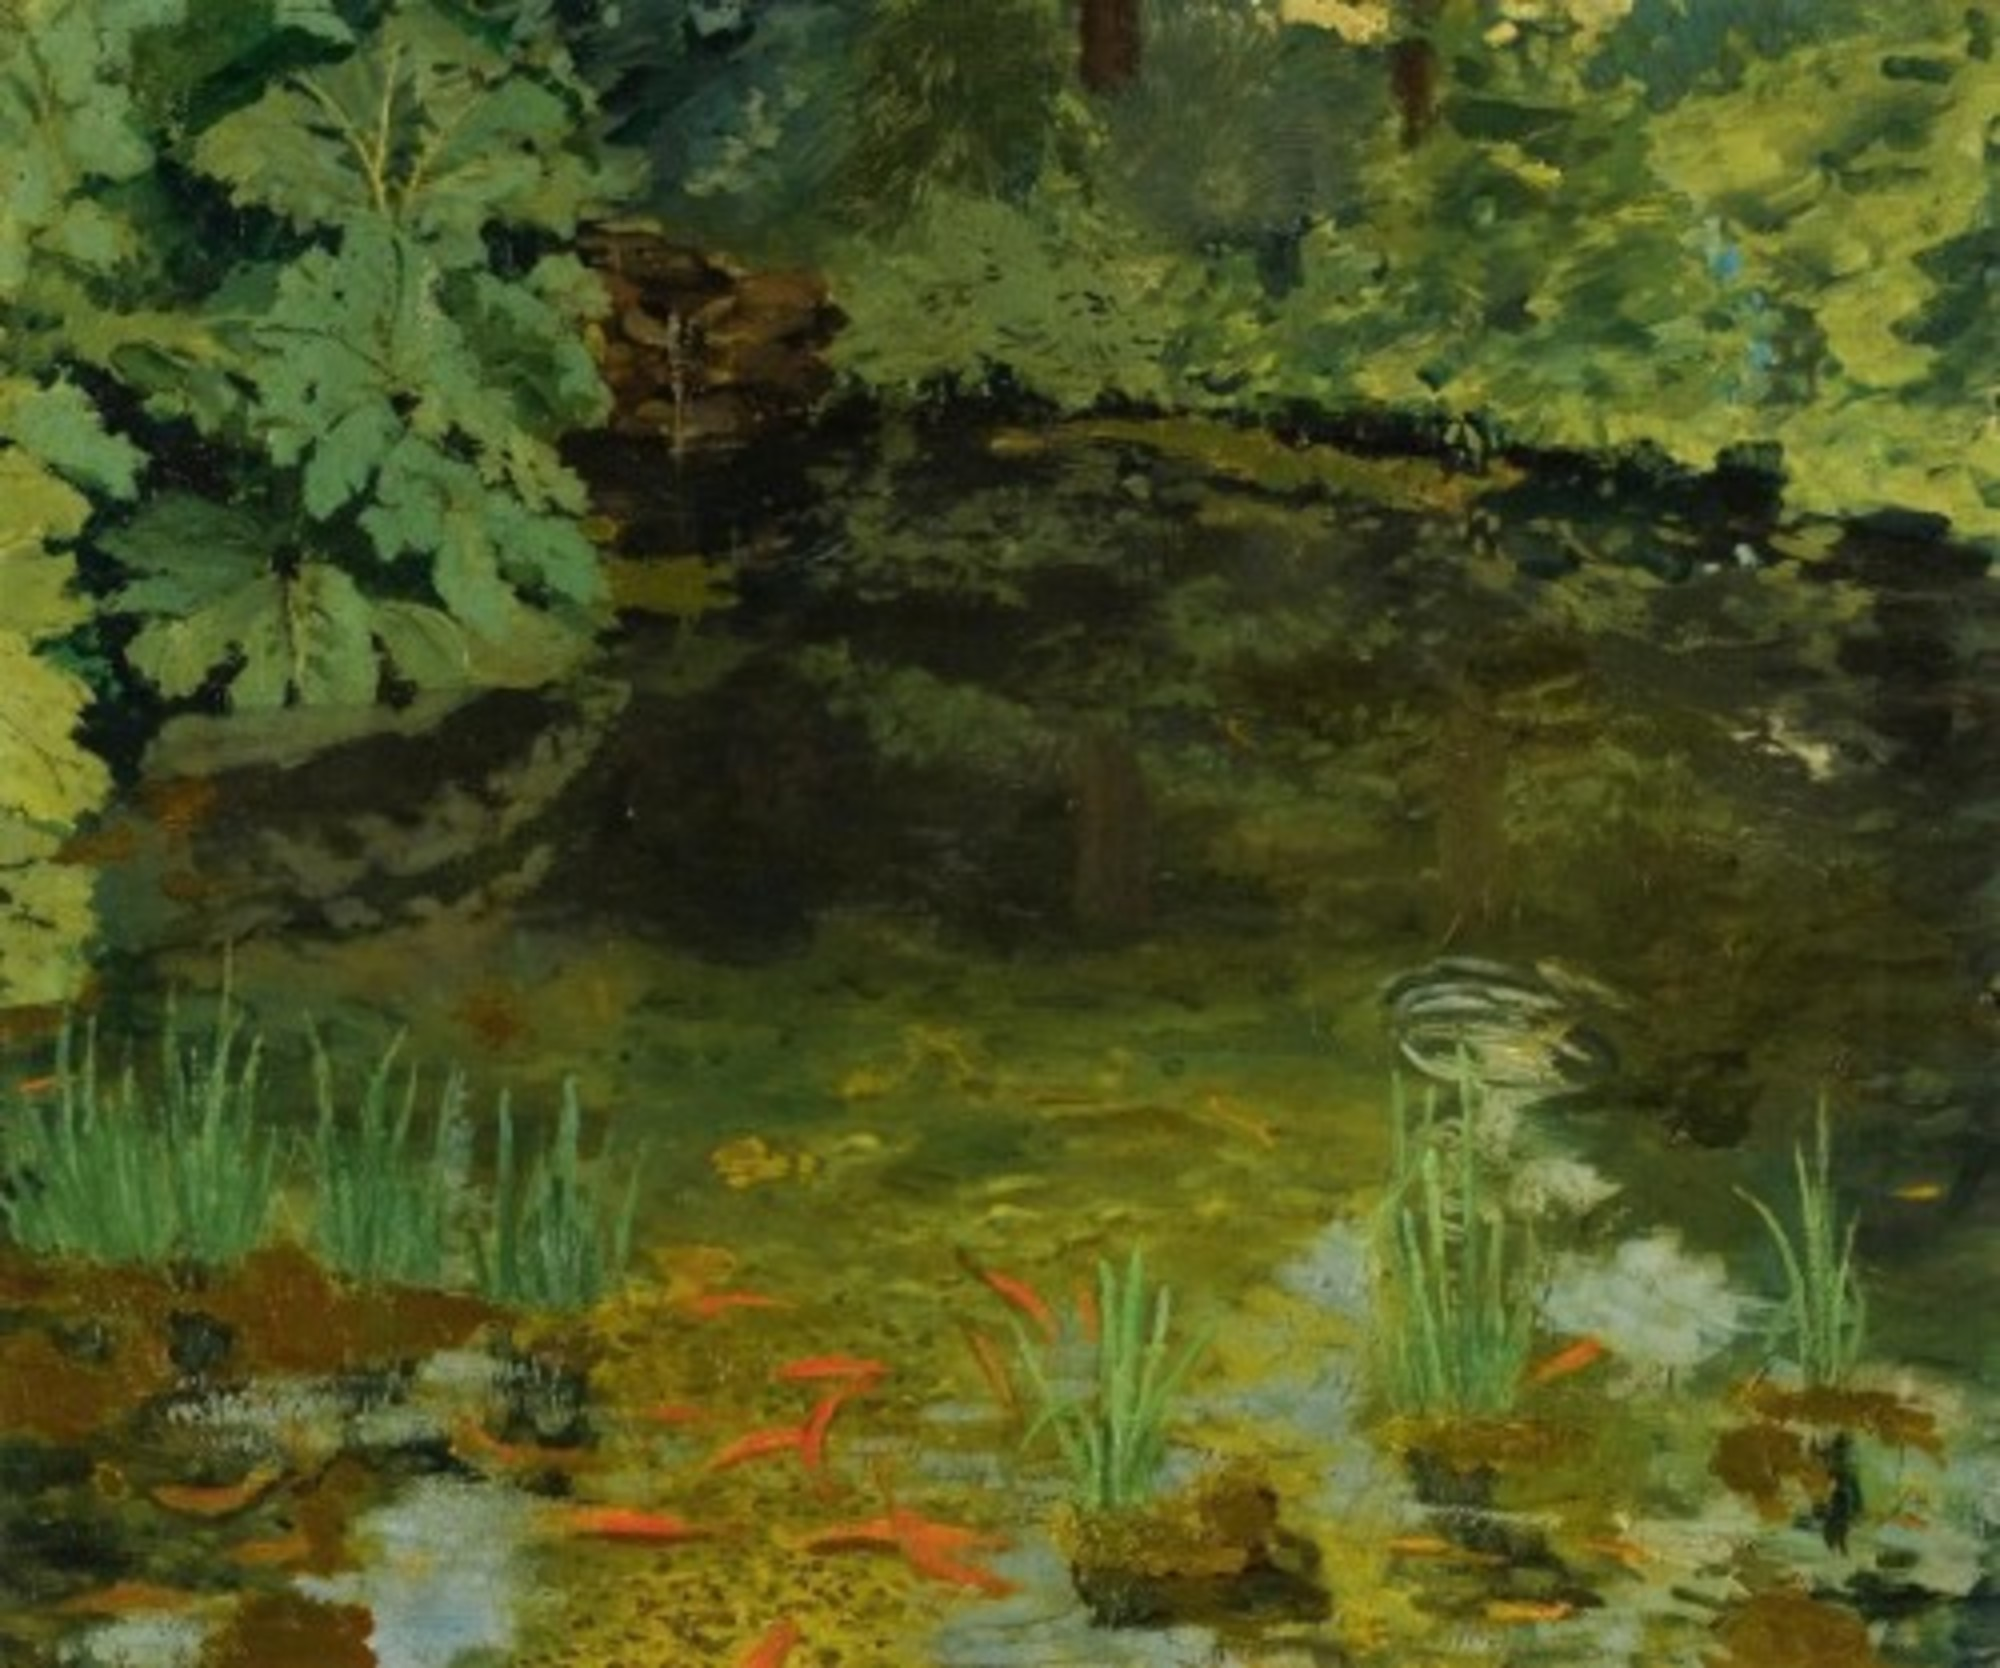 Winston-Churchill-painting-sells-for-record-282M.jpg